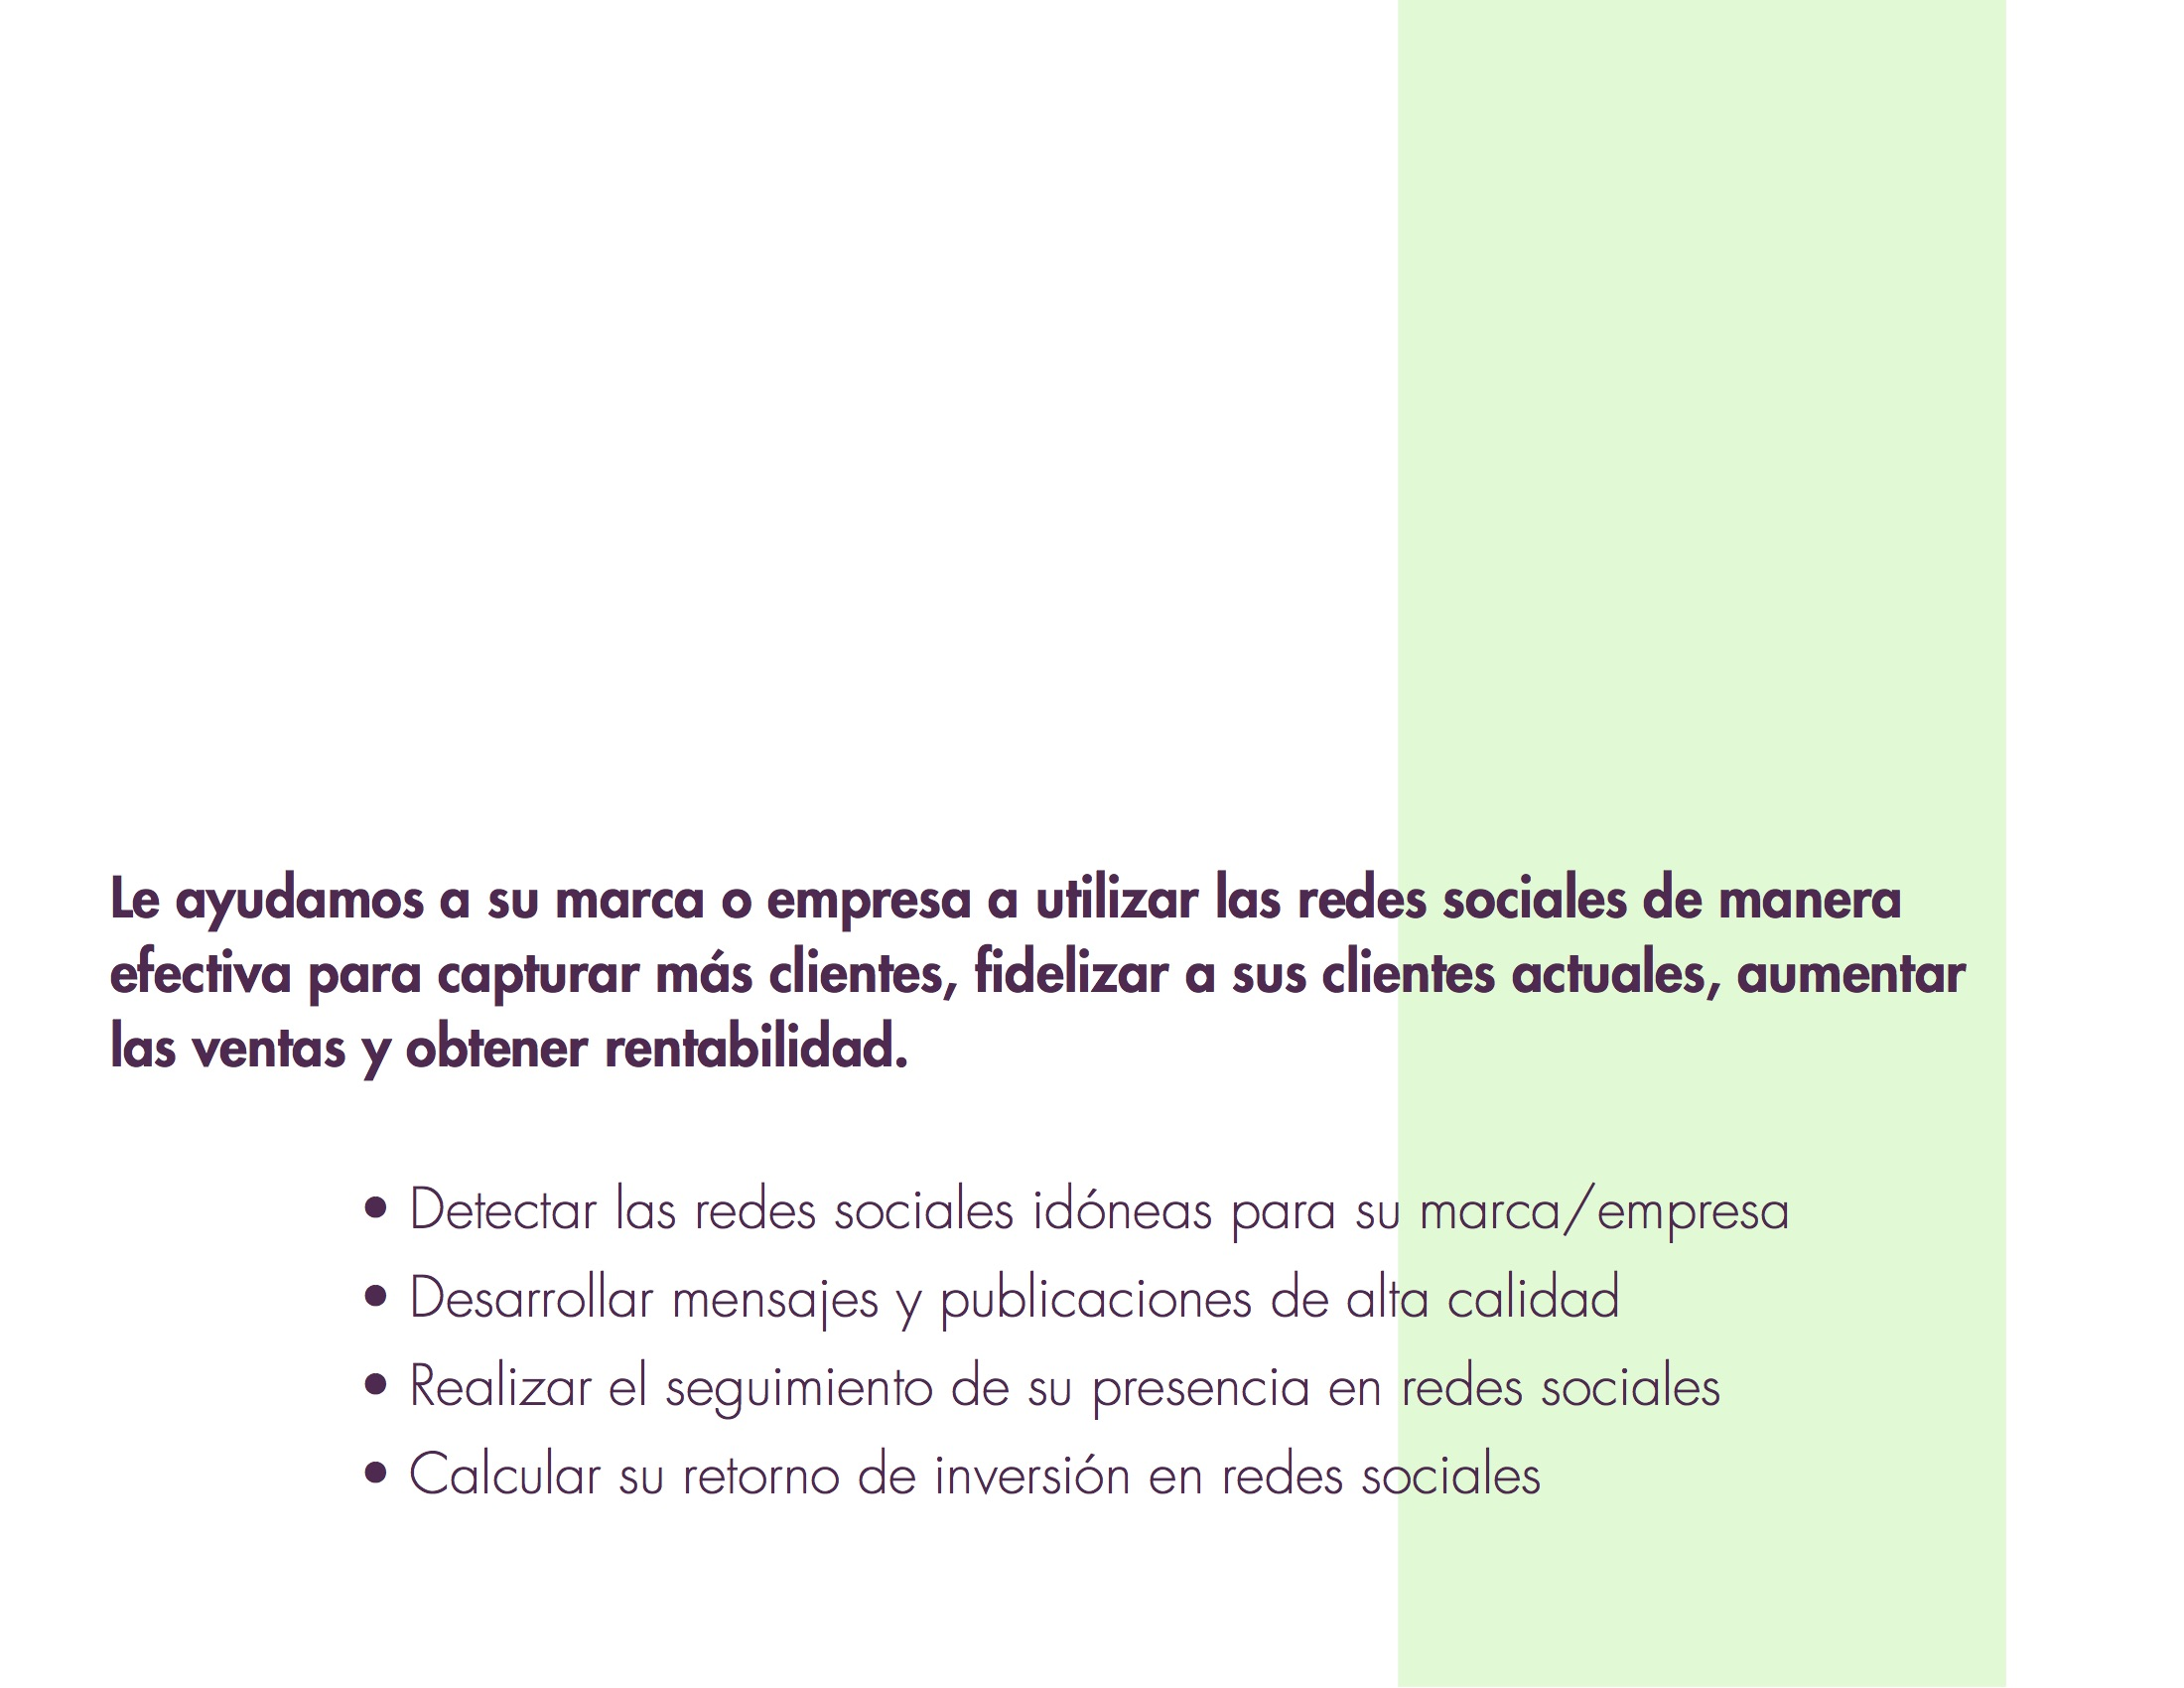 KREO_PRESENTACION9.jpg